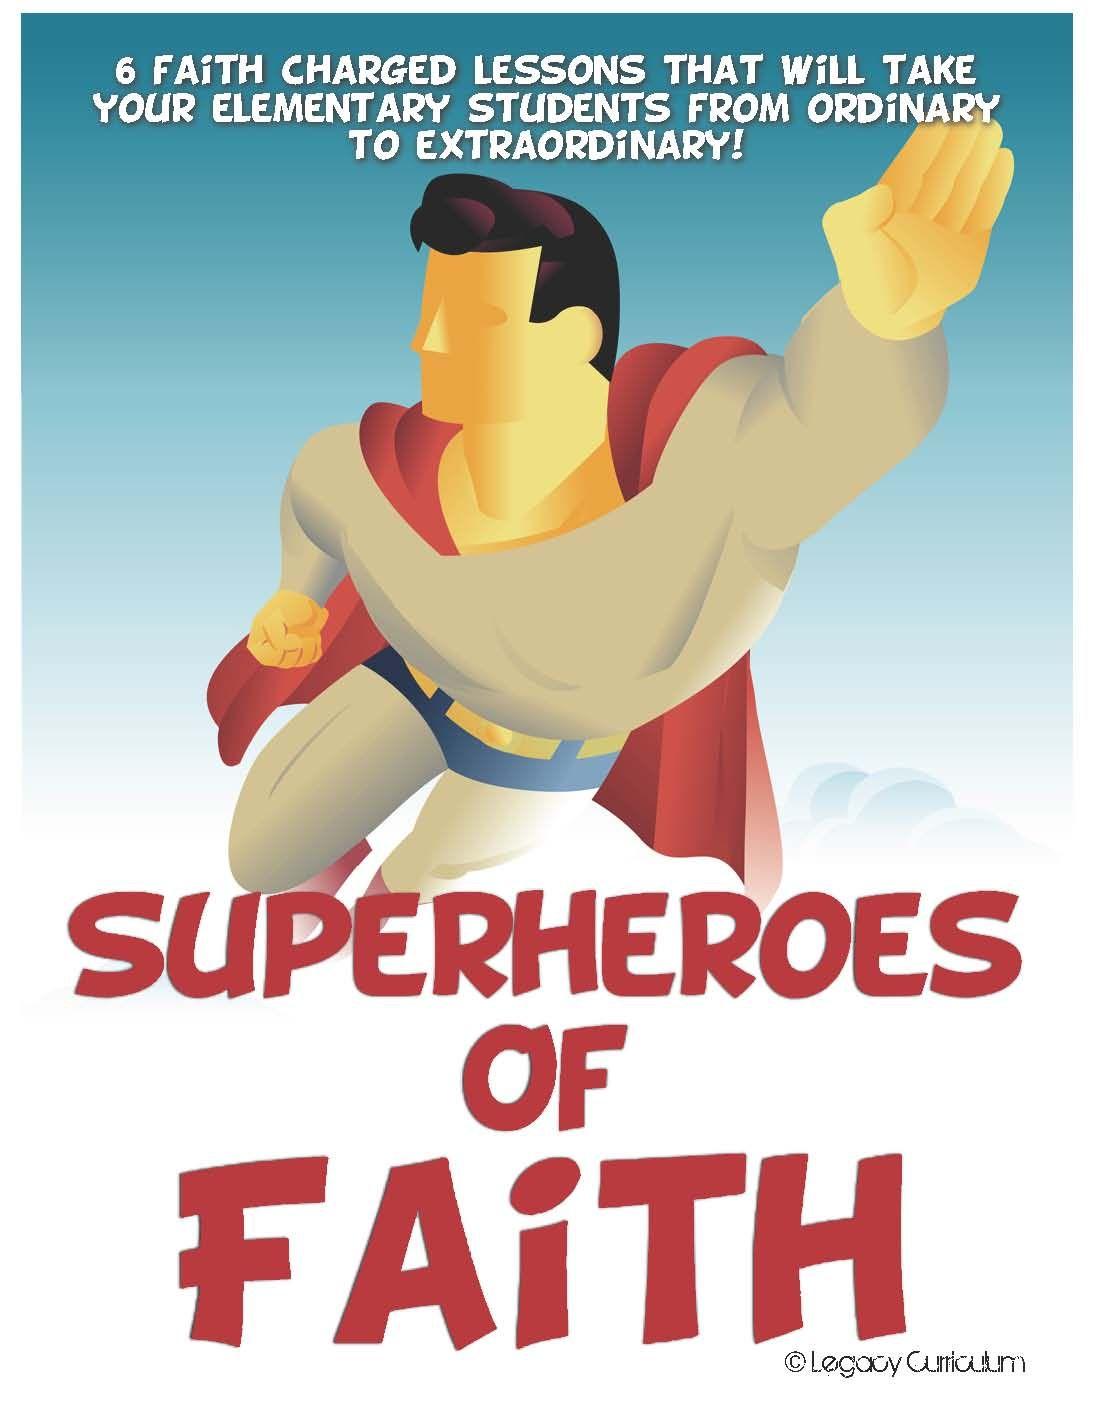 Superheroes of faith week. Bible clipart superhero